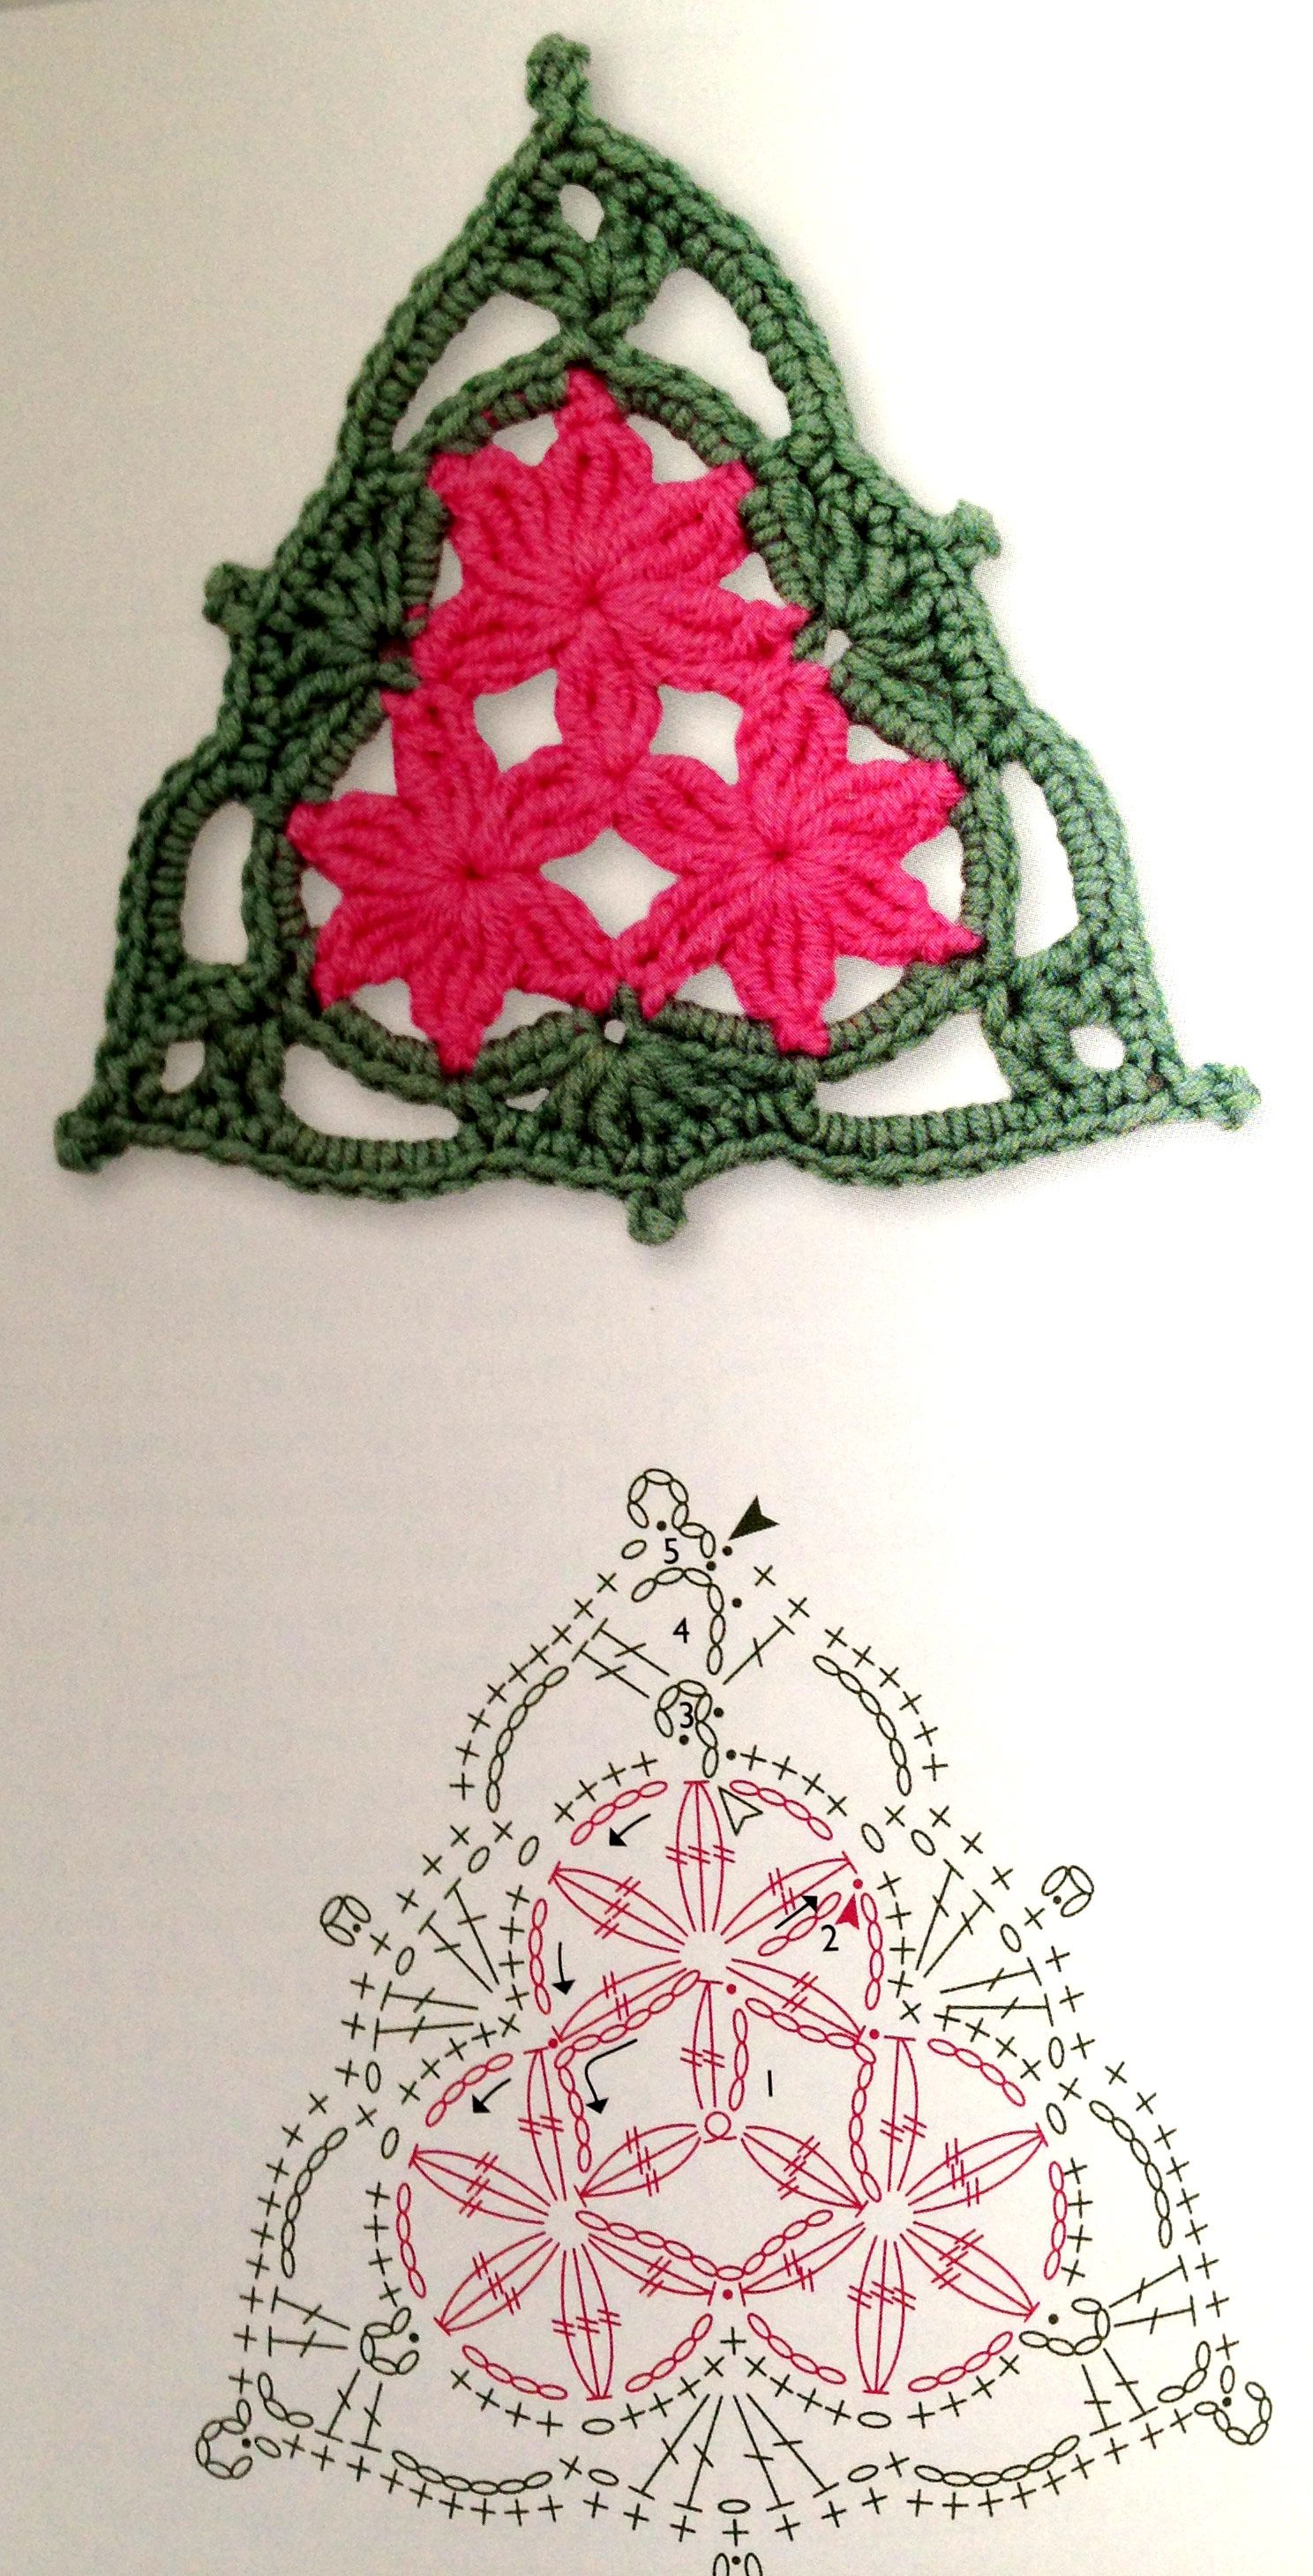 crochet granny square diagram 2001 dodge dakota sport stereo wiring triangle flower chart 4u hilariafina http www